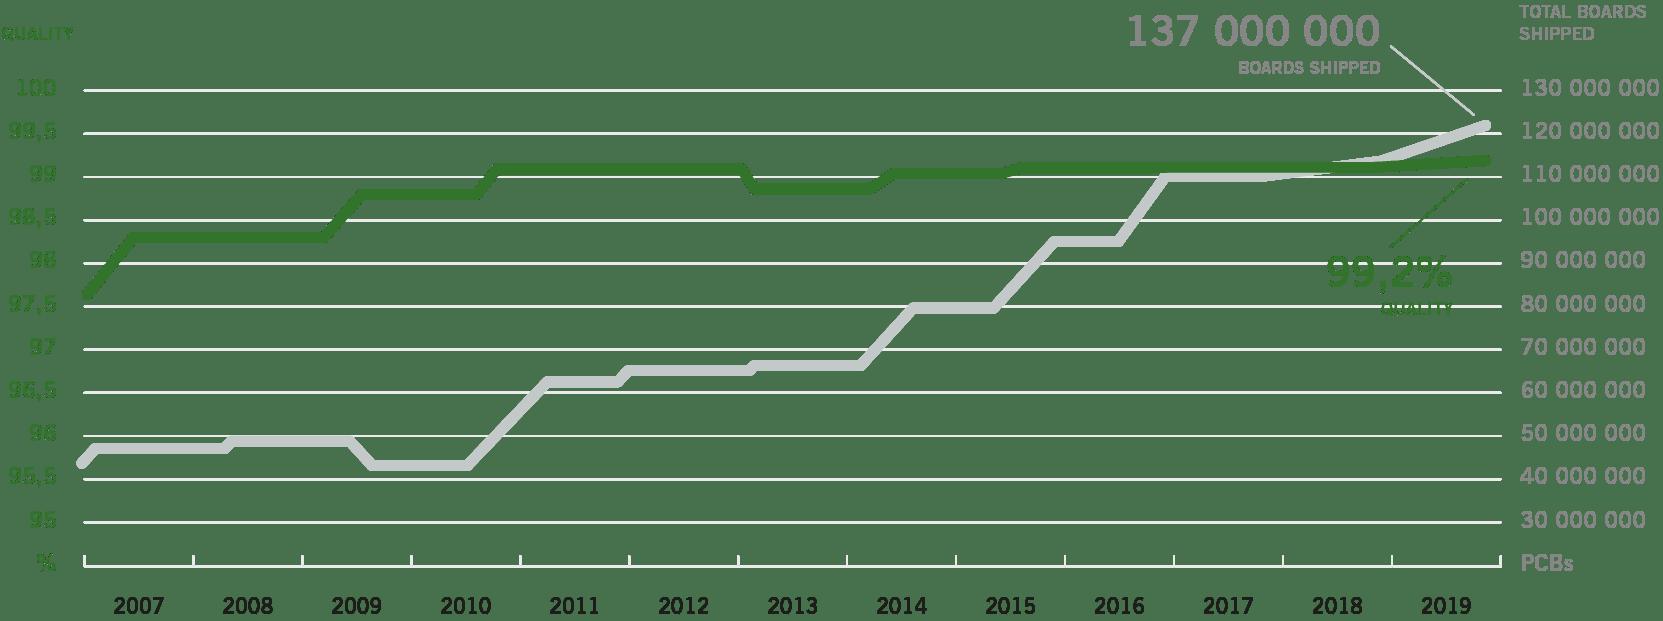 quality performance graph